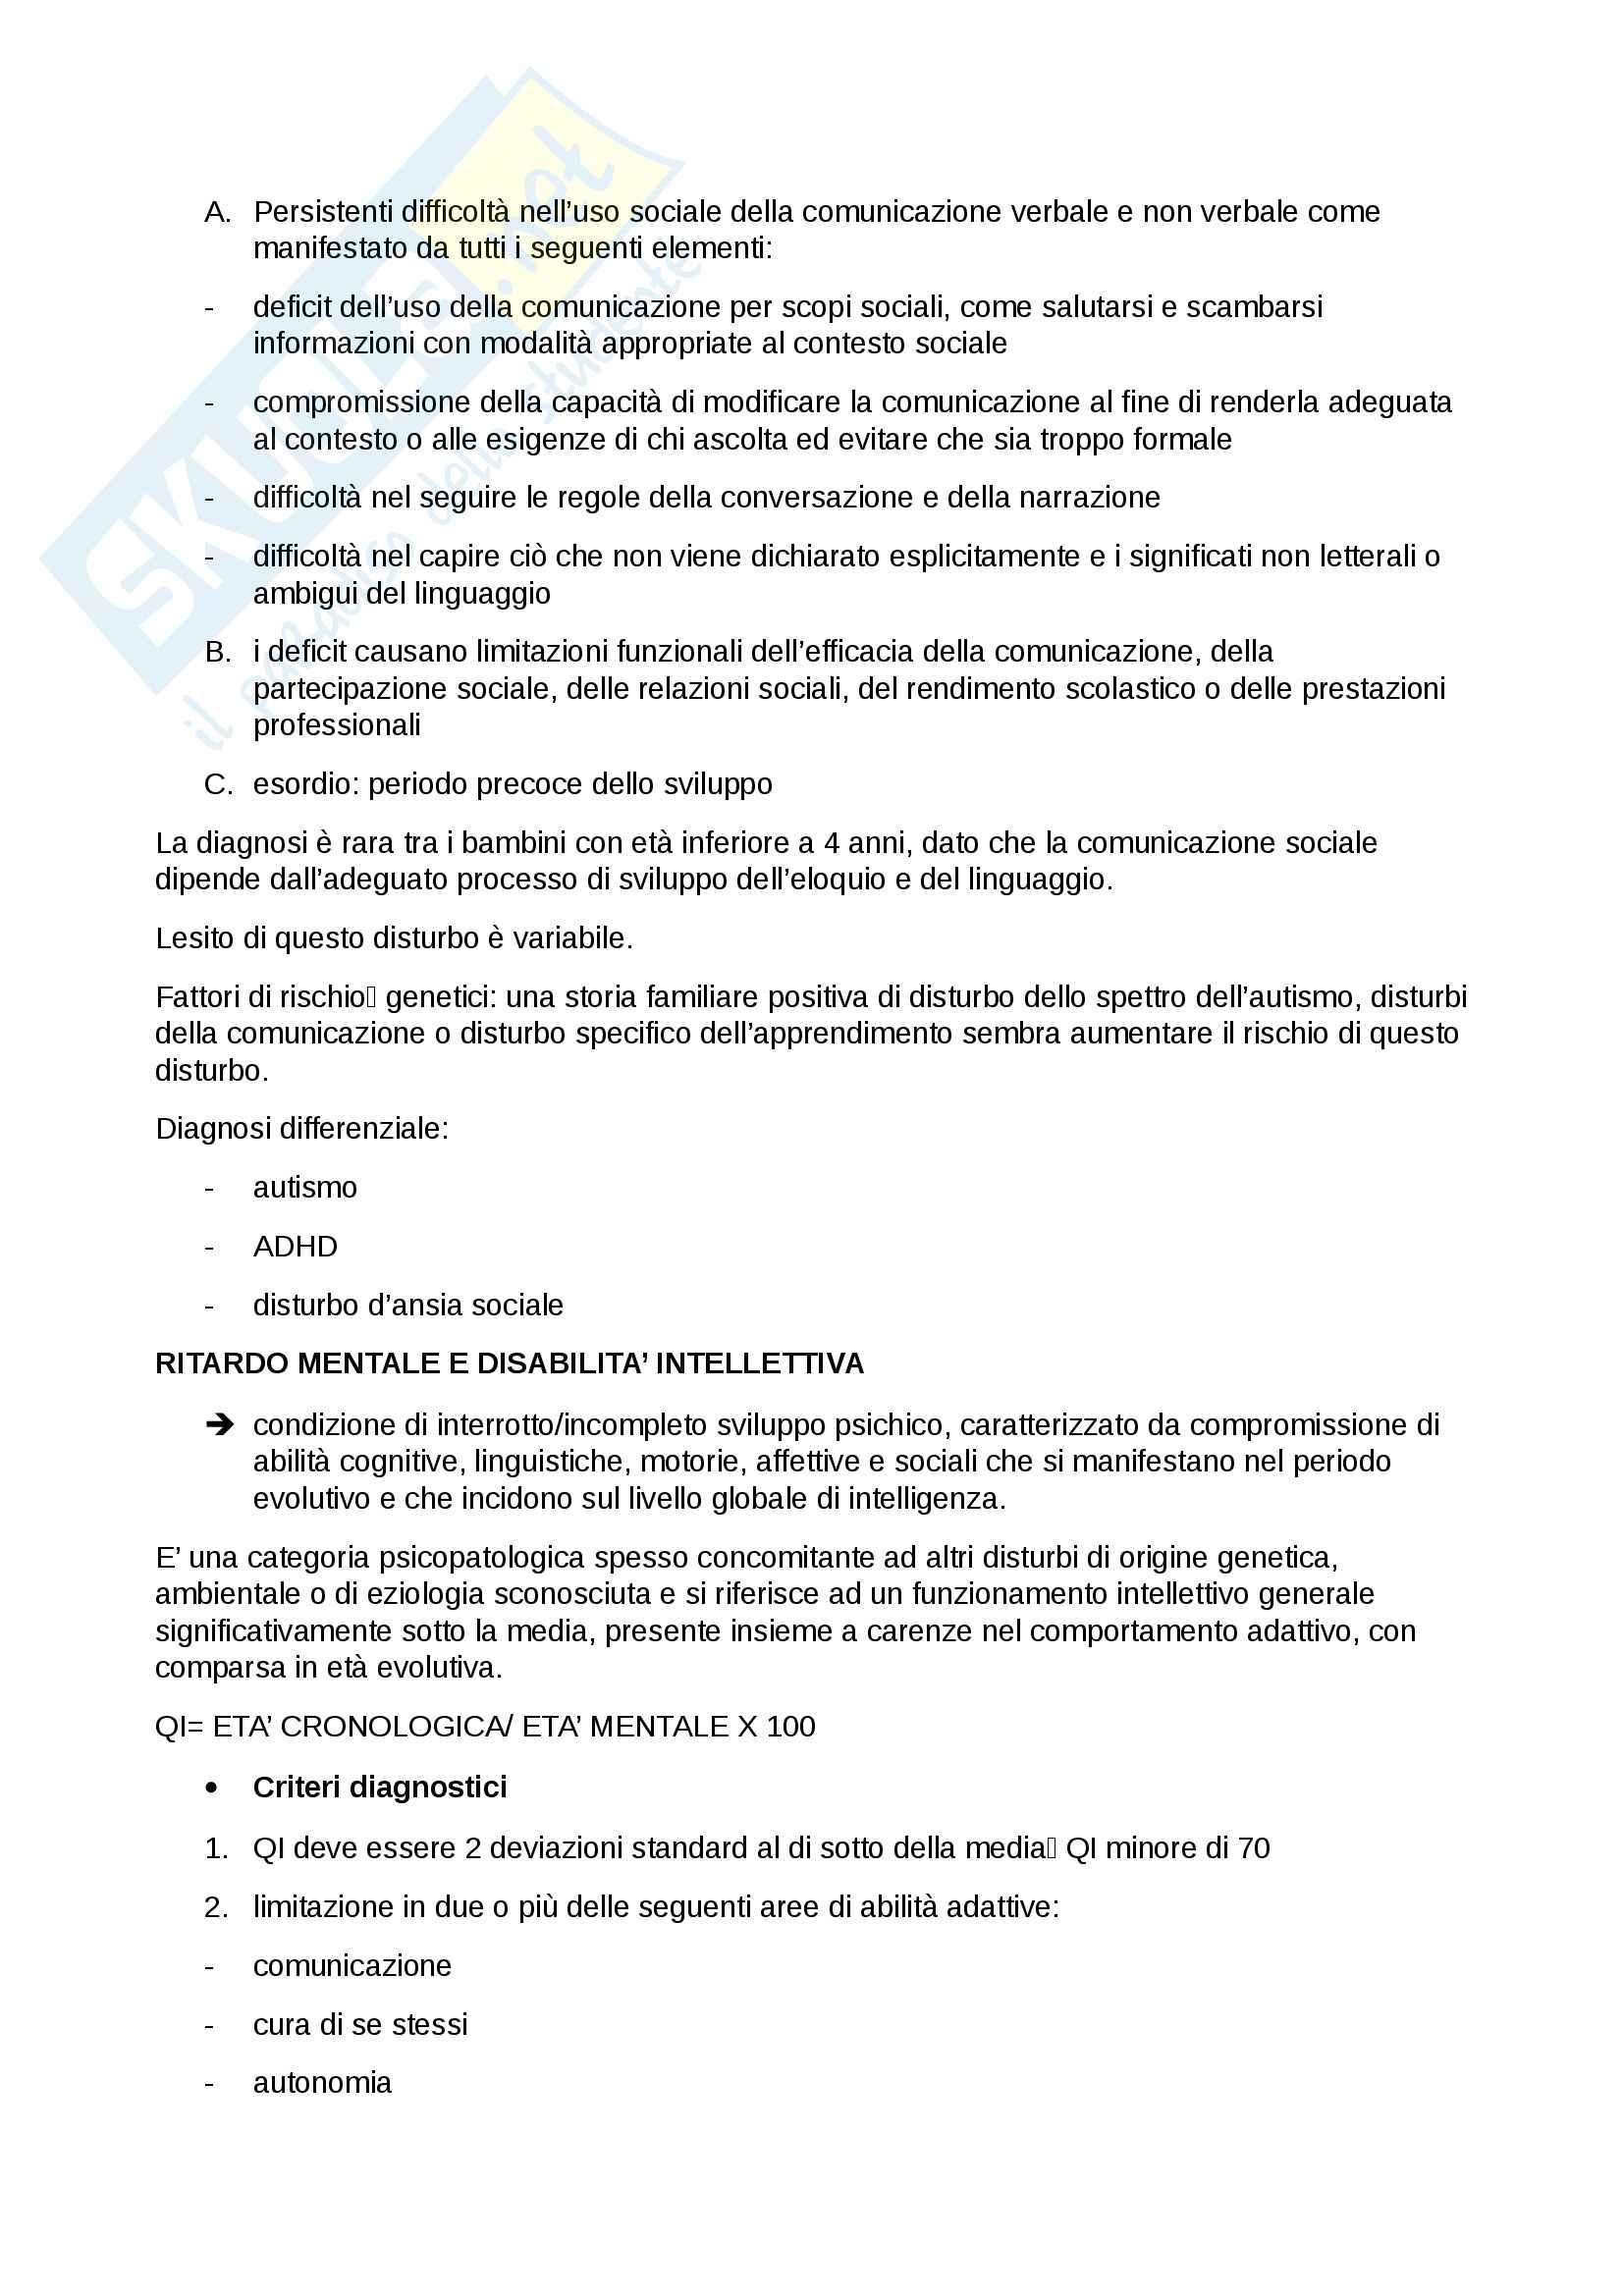 neuropsichiatria infantile Pag. 6